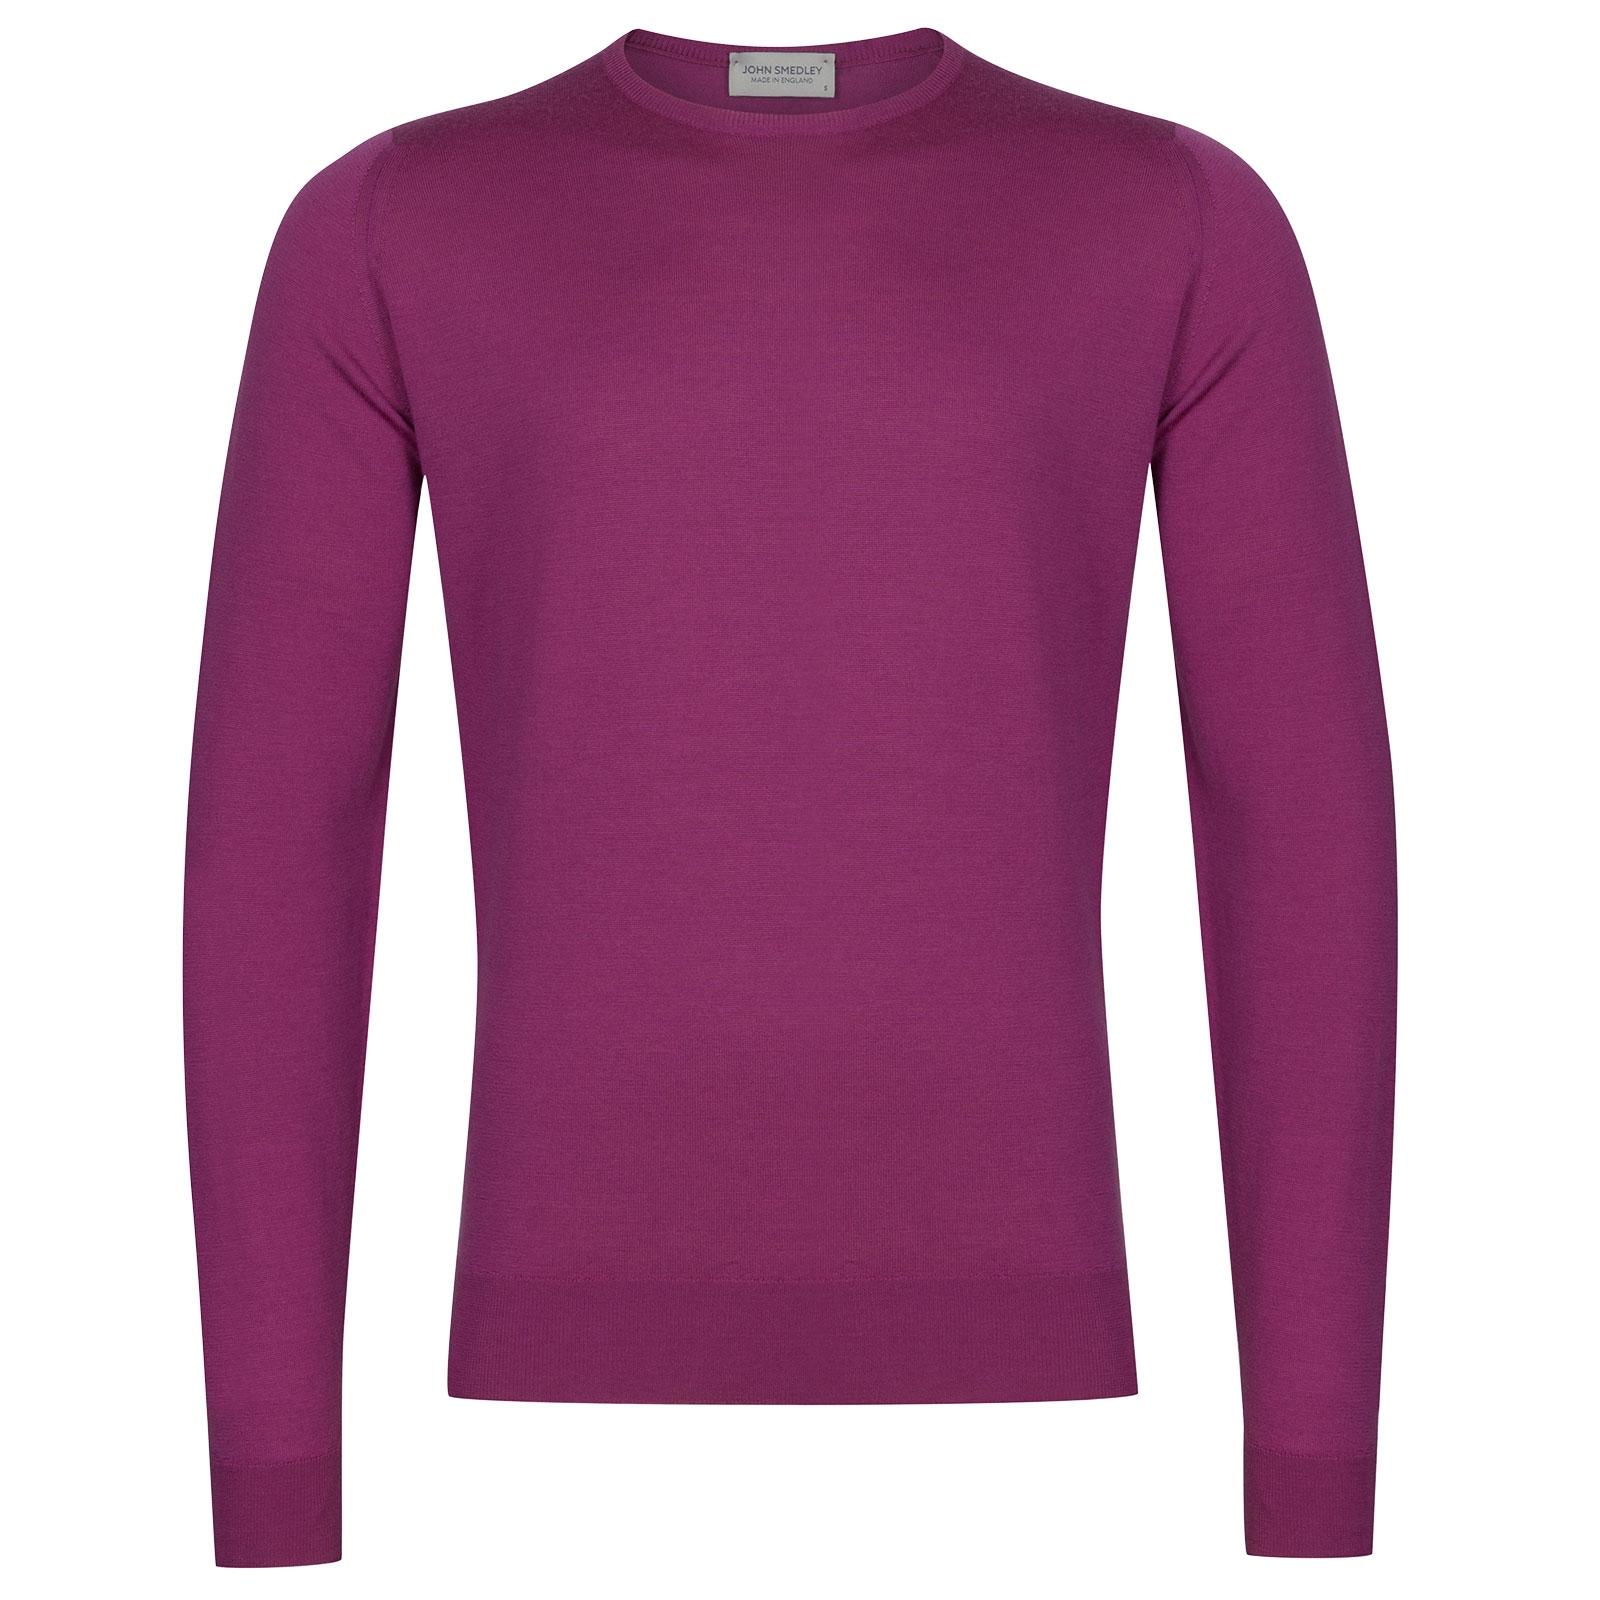 John Smedley Lundy Merino Wool Pullover in Prism Violet-XXL